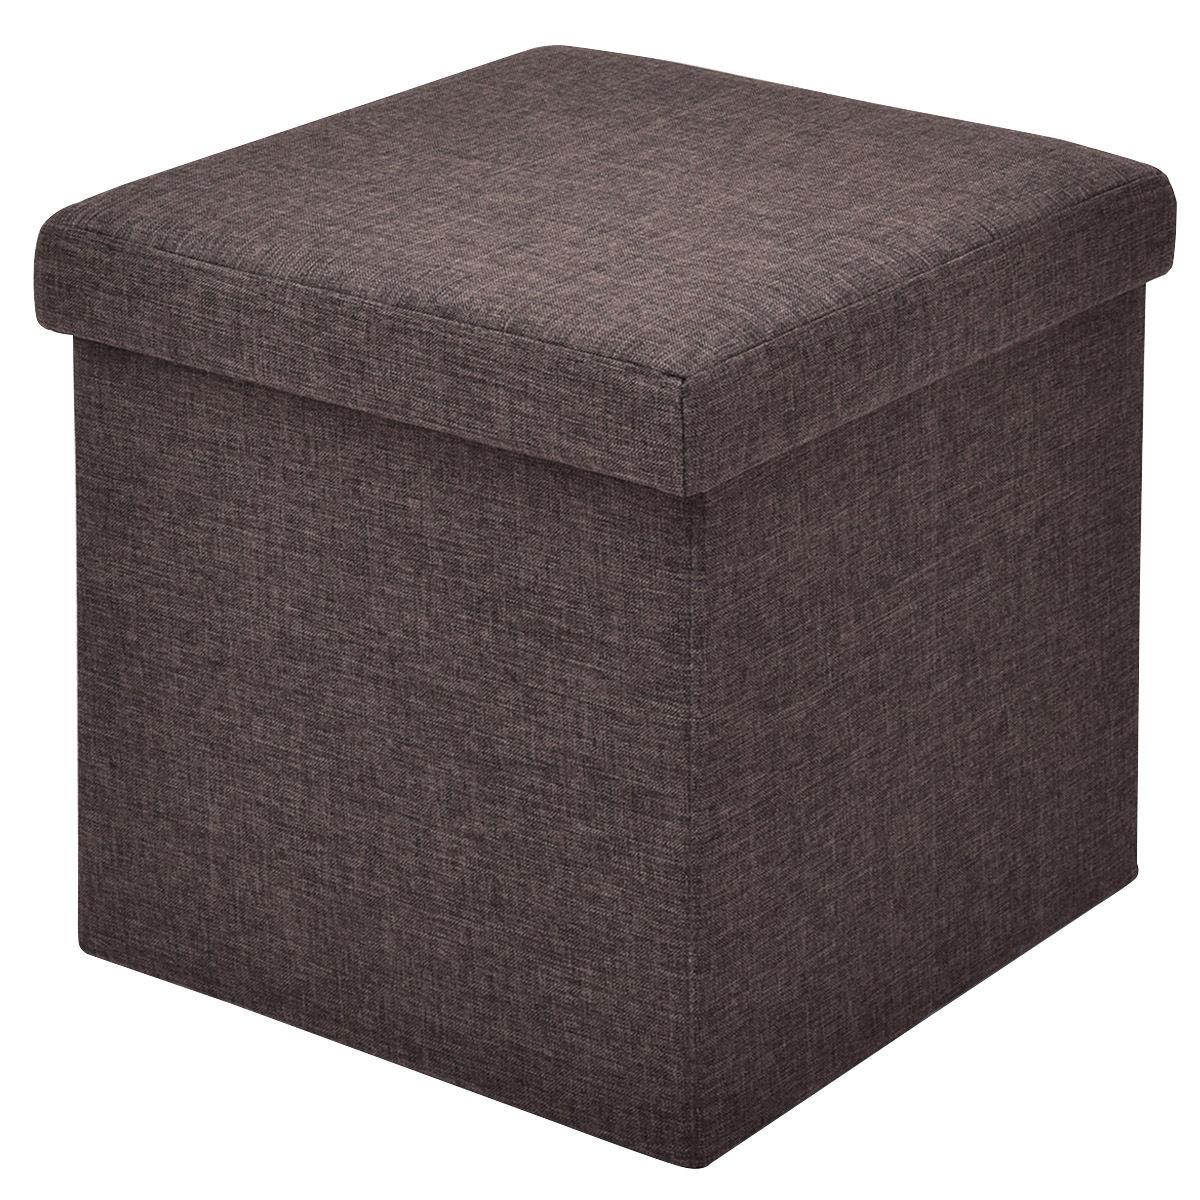 Gymax Folding Storage Square Ottoman Seat Stool Box Footrest Home Furni Decor Brown